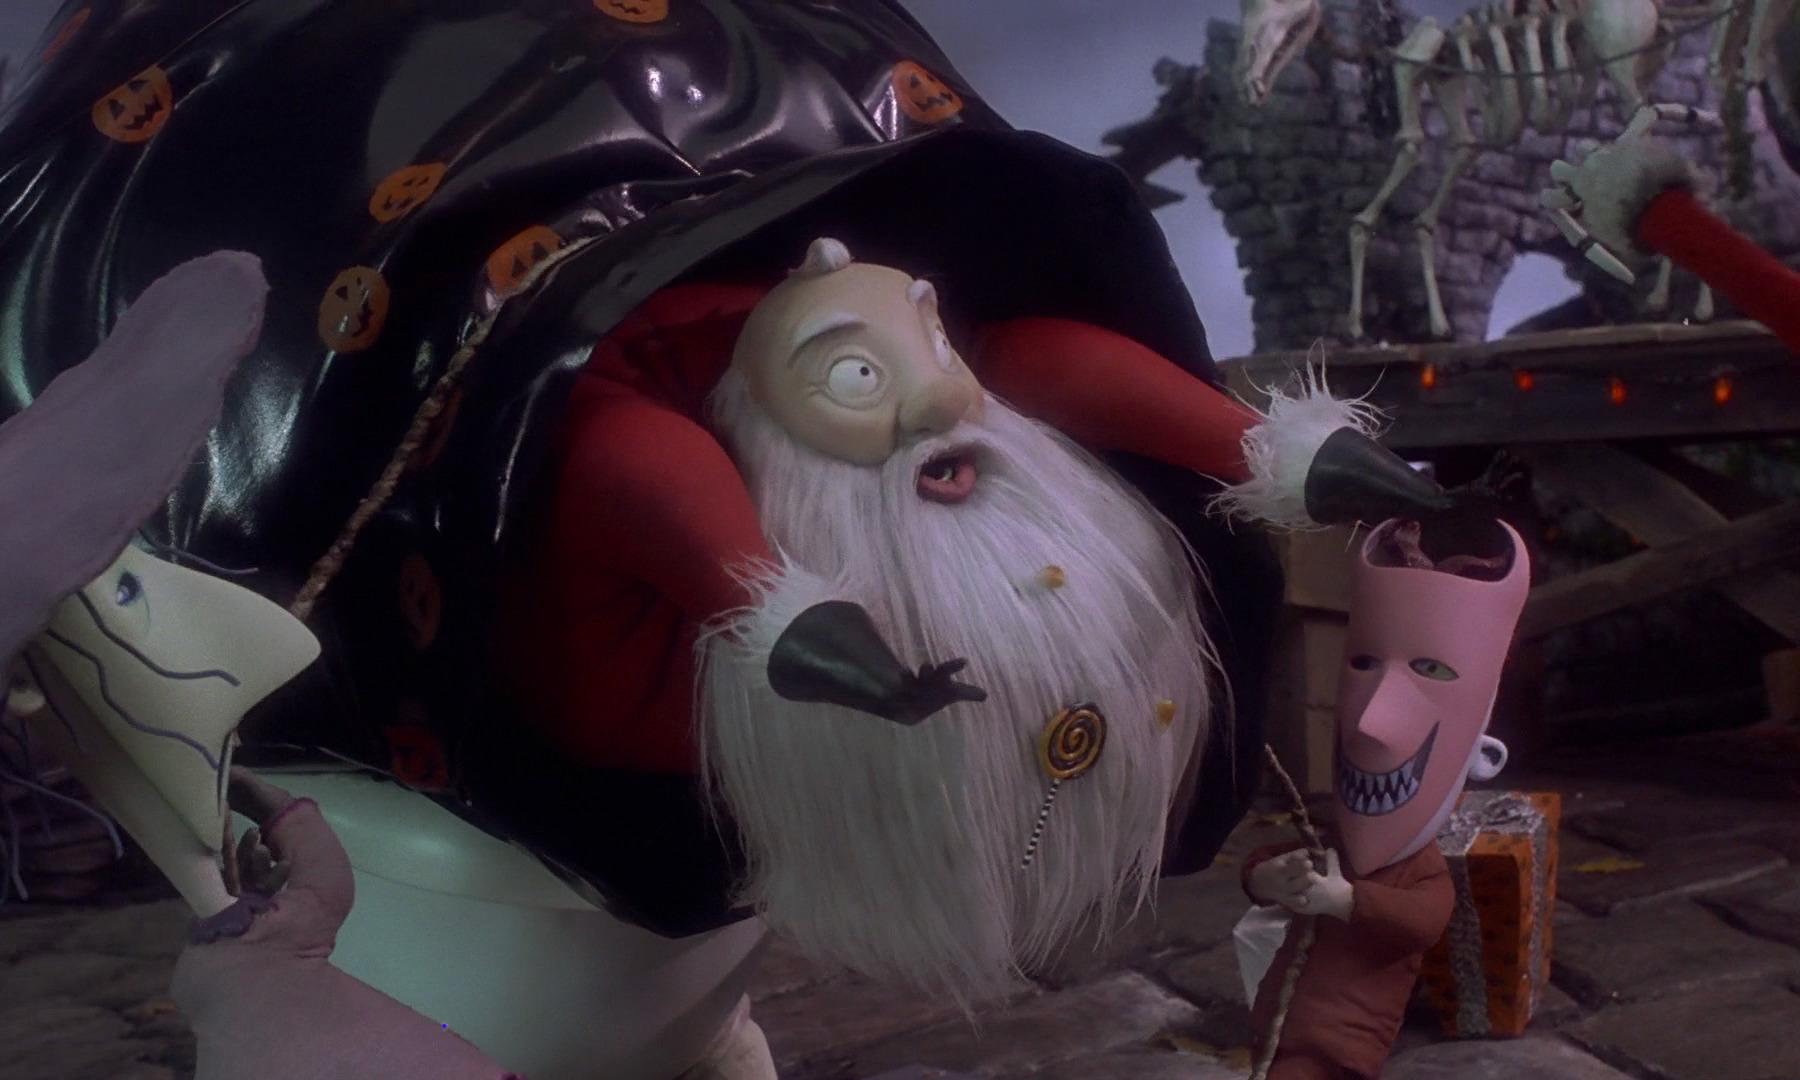 Snap Santa Claus The Nightmare Before Christmas Heroes Wiki FANDOM ...